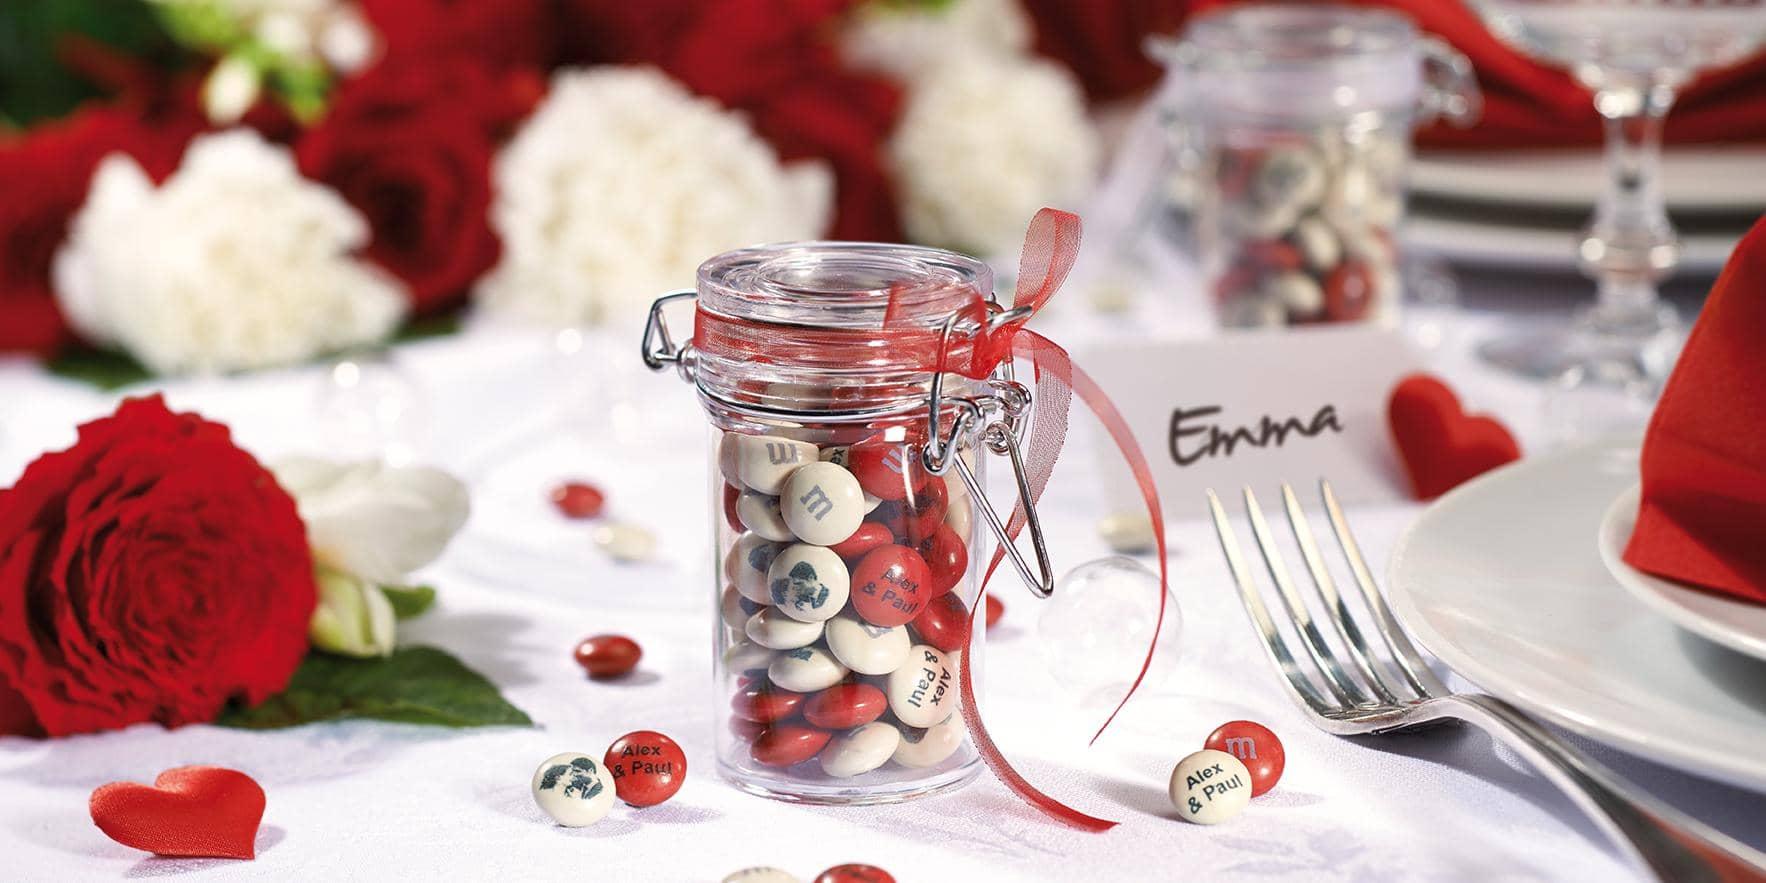 allestire uno sweet table